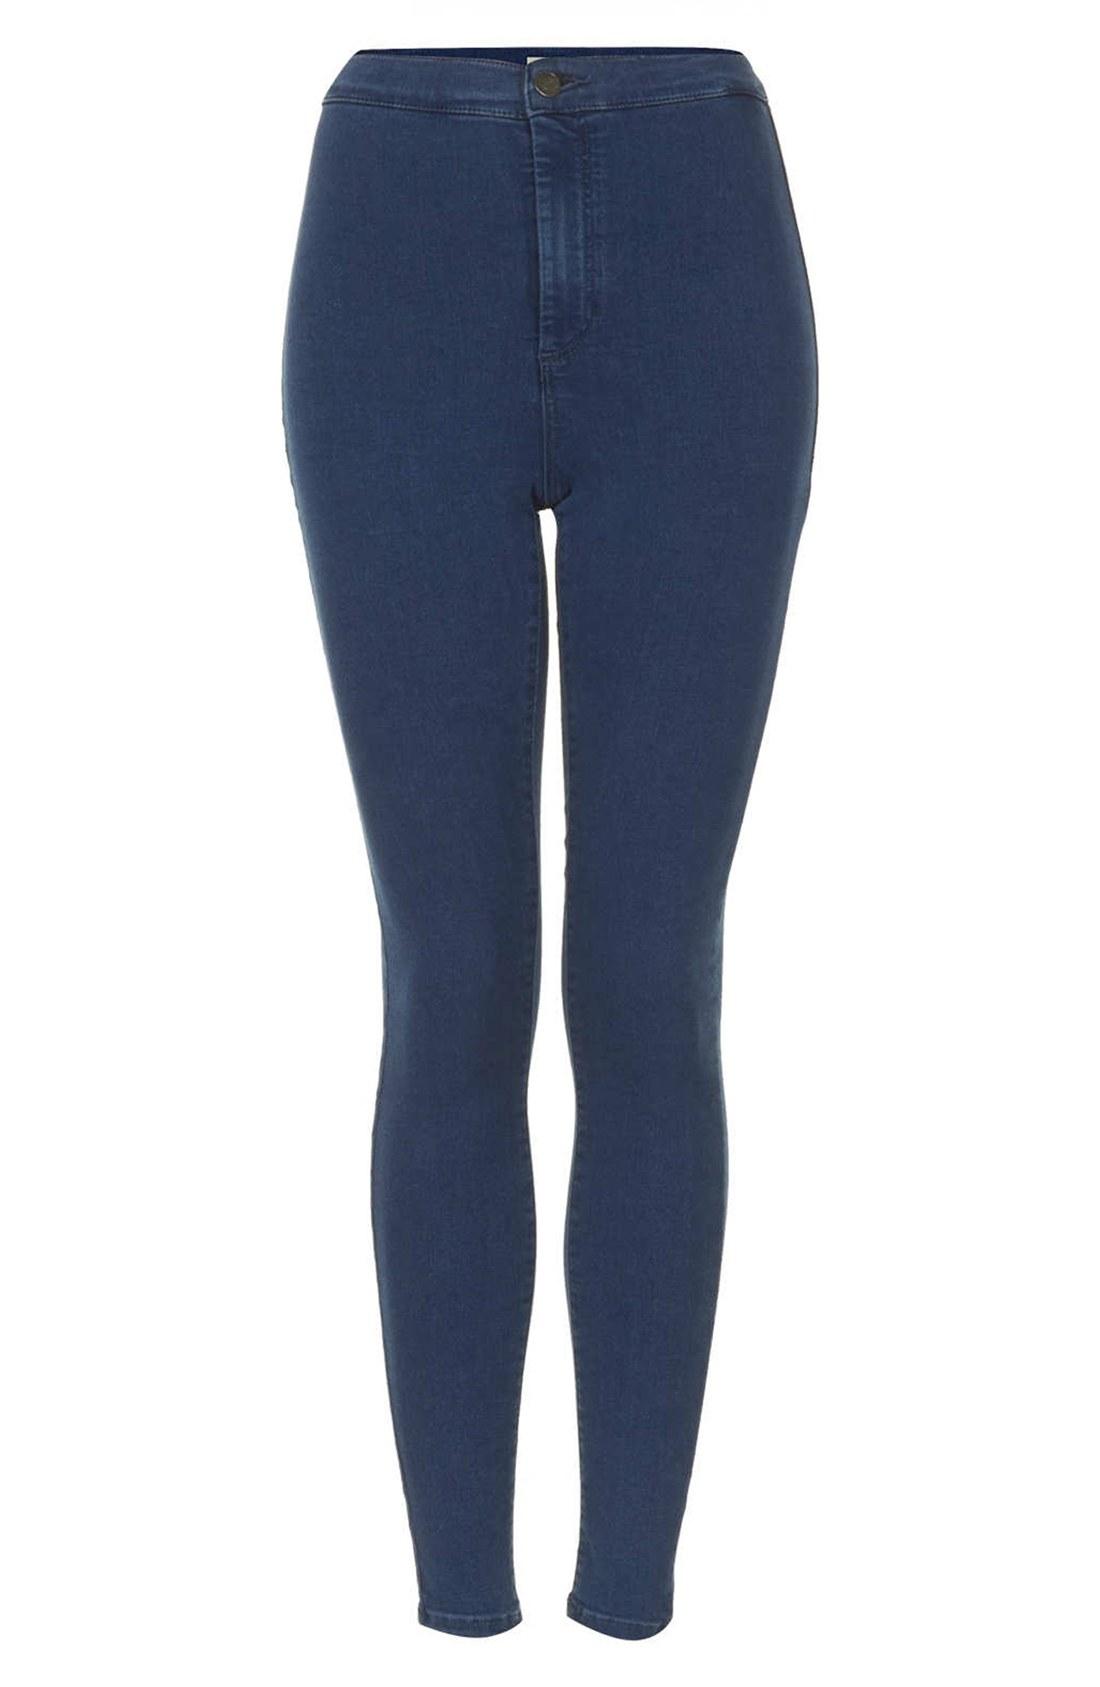 topshop moto joni high waist skinny jeans in blue. Black Bedroom Furniture Sets. Home Design Ideas